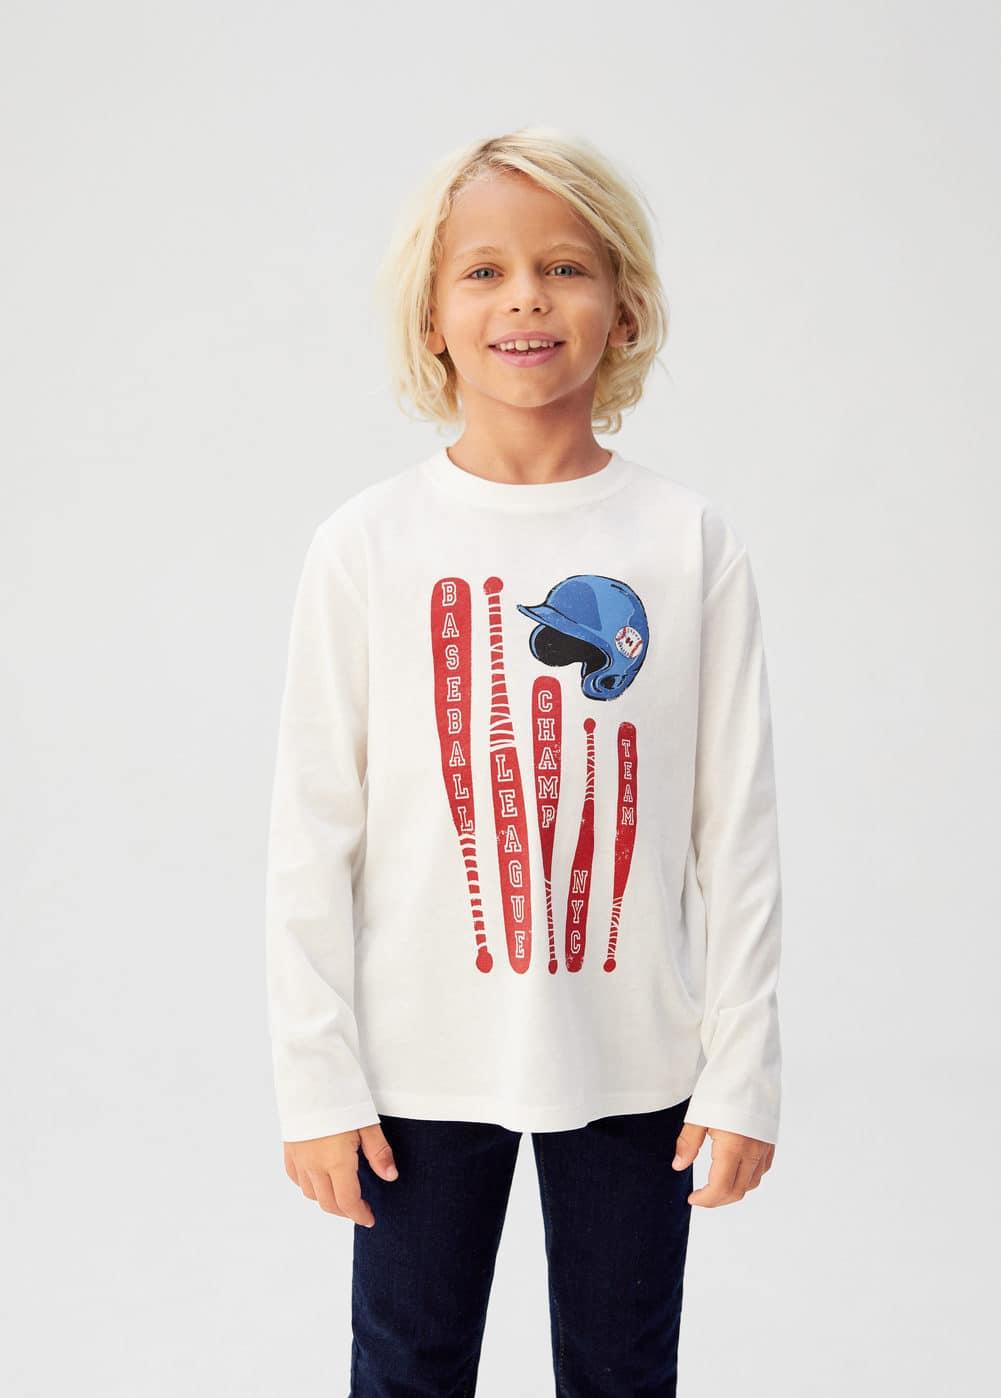 o-champ:camiseta algodon organico estampada